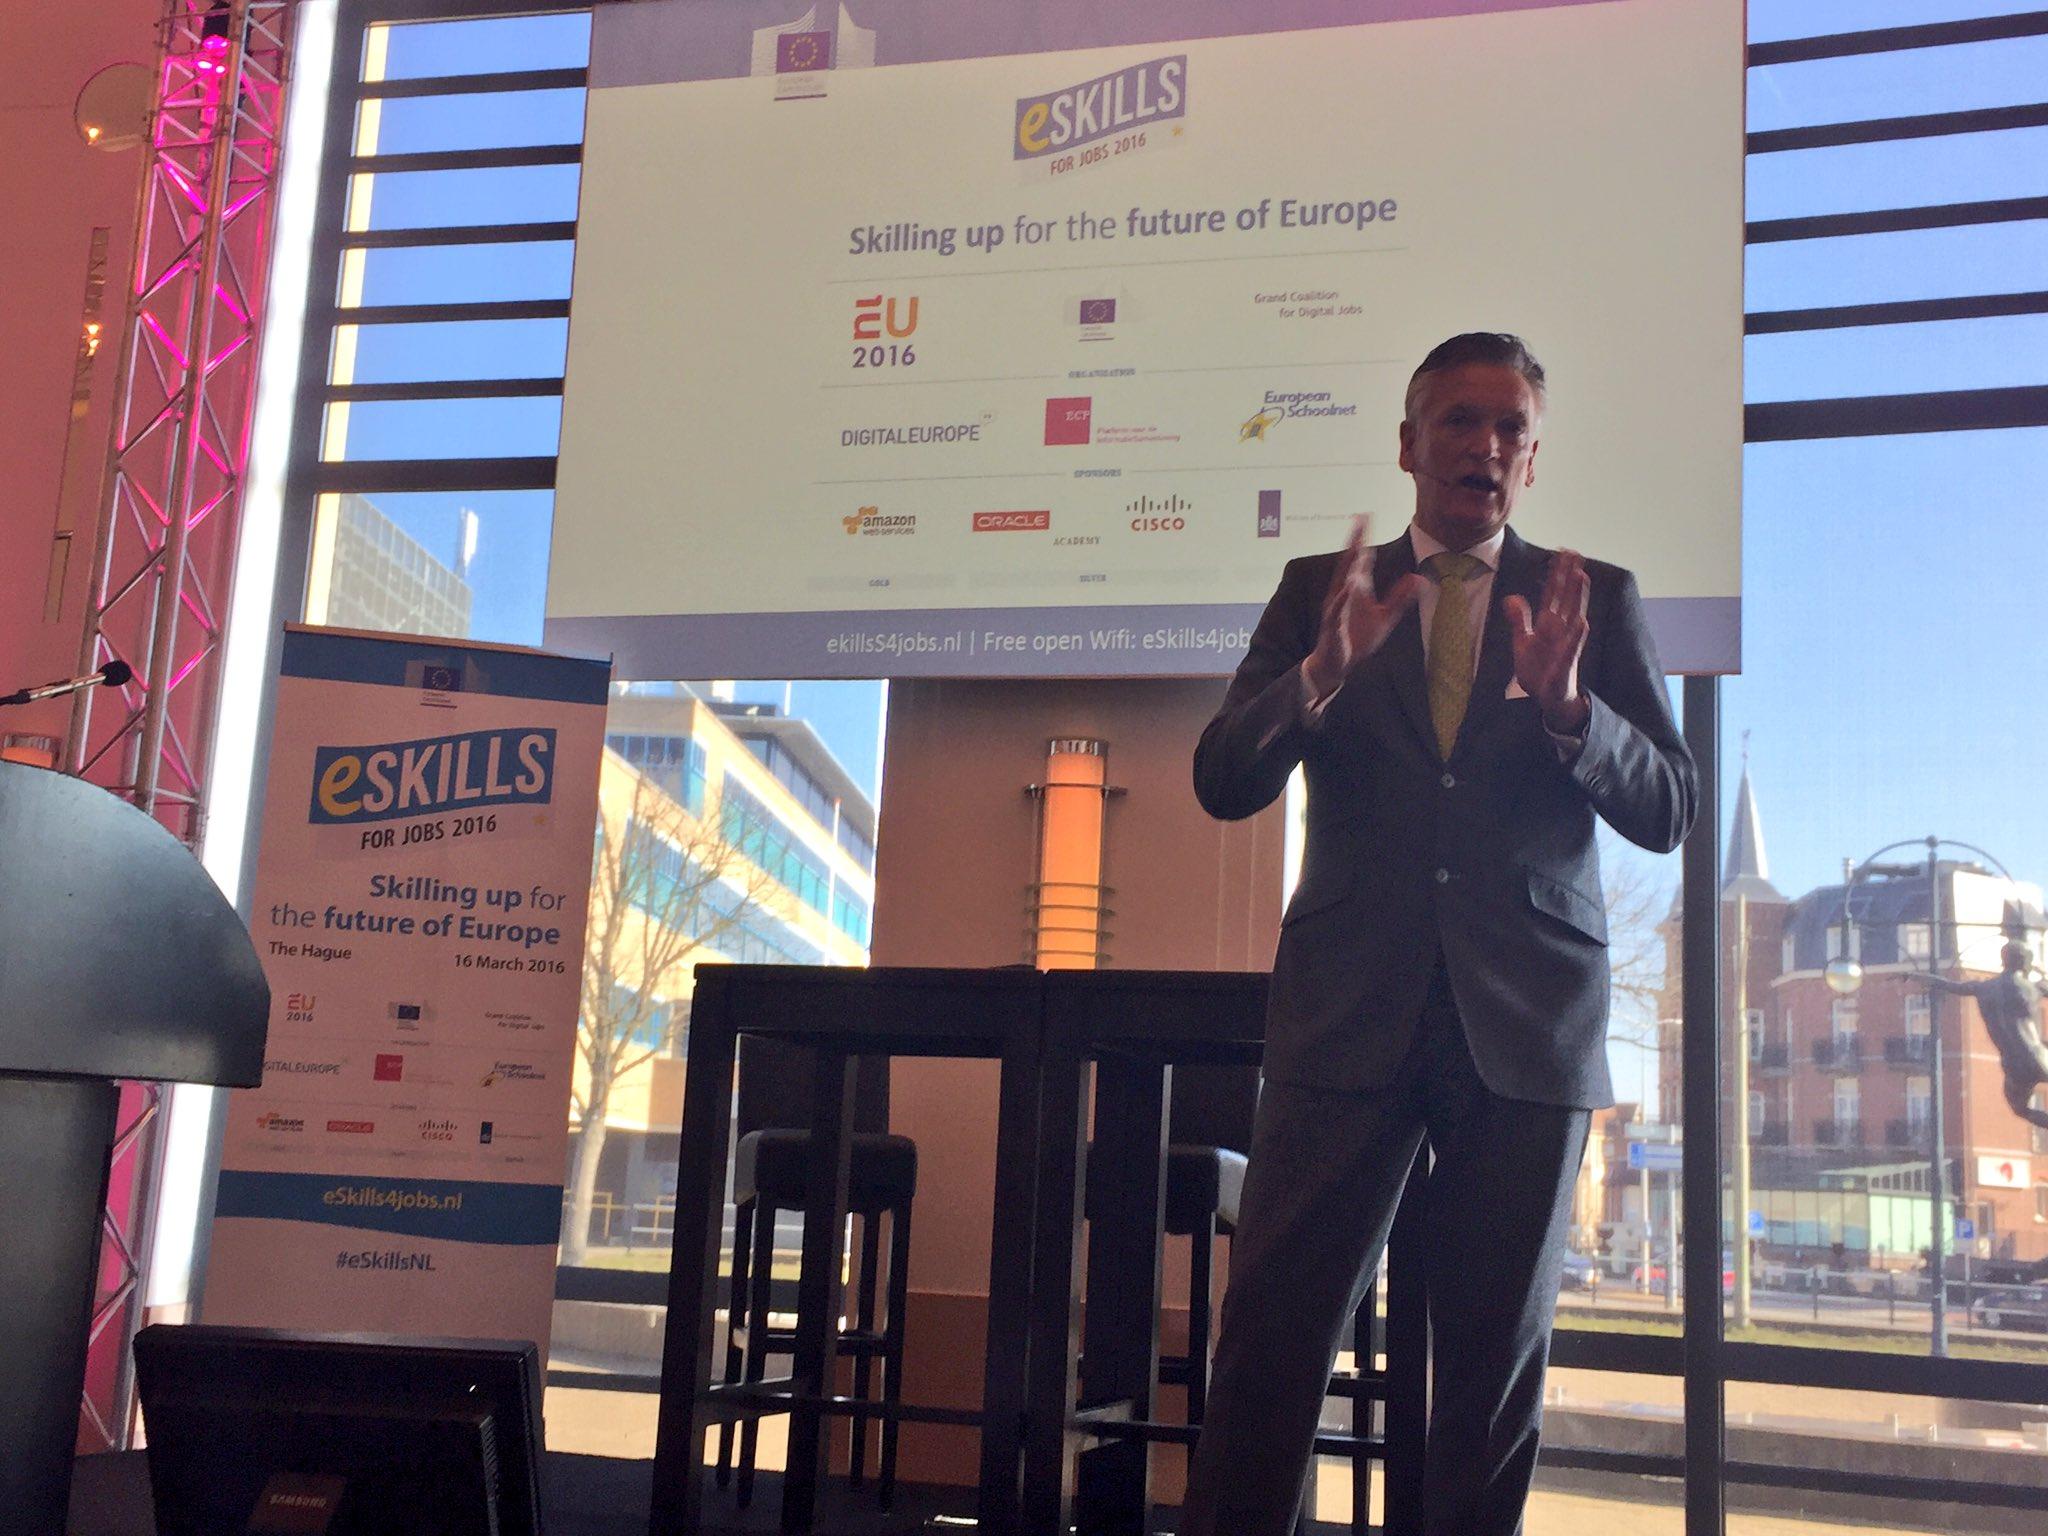 ".@harryvandorenma promotes ""framework for #success to close the #Digitalskills gap in Europe"" at #eSkillsNL https://t.co/9Uc9fHZCAc"